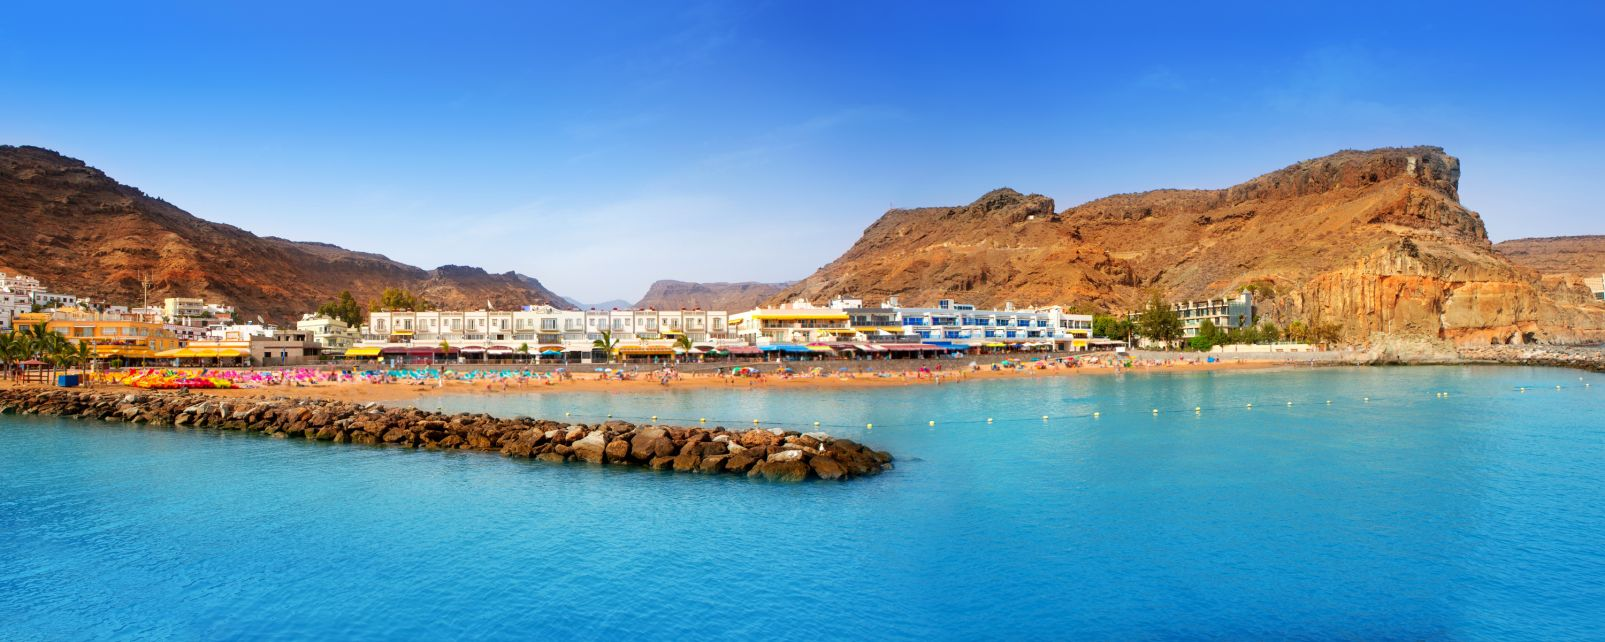 Gran Canaria - Puerto de Mogan, Die Küsten, Kanarische Inseln